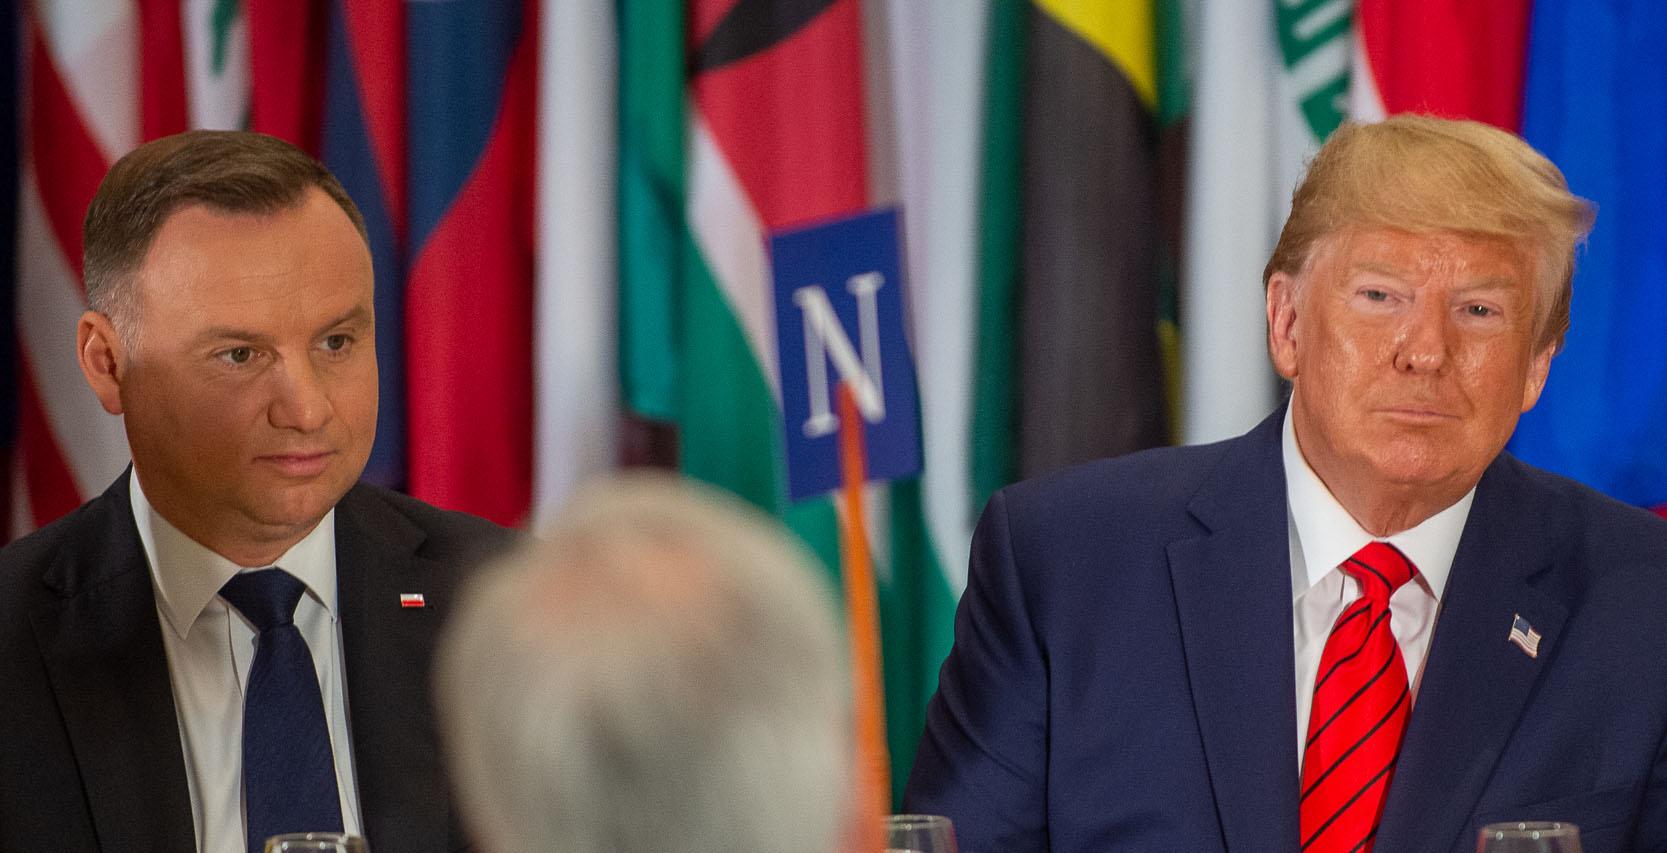 NATO Secretary General visits the United States - NATO North Atlantic Treaty Organization